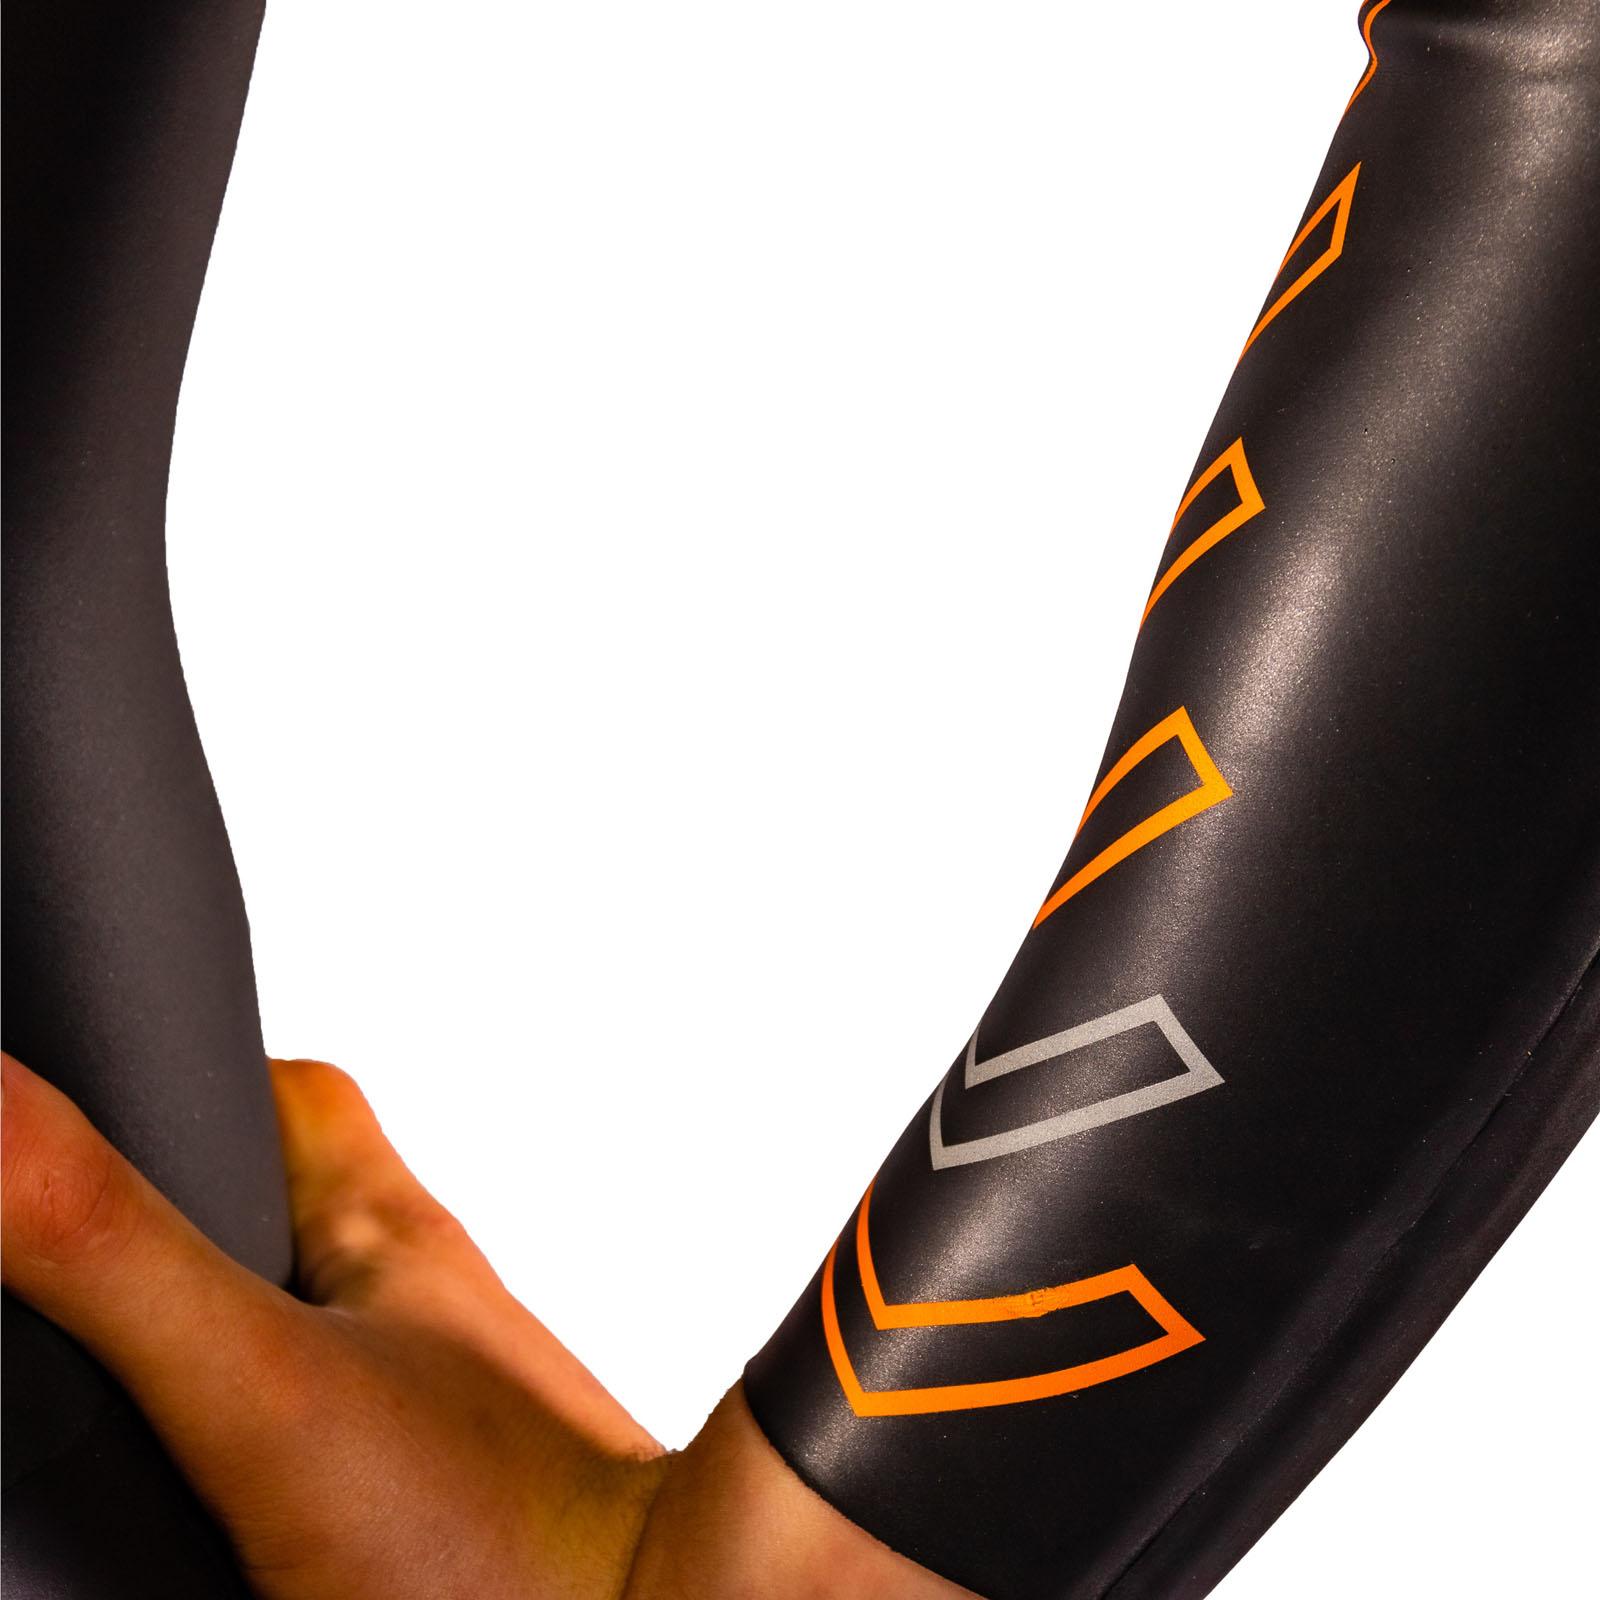 Yonda 2020 Spectre - Men's Wetsuit